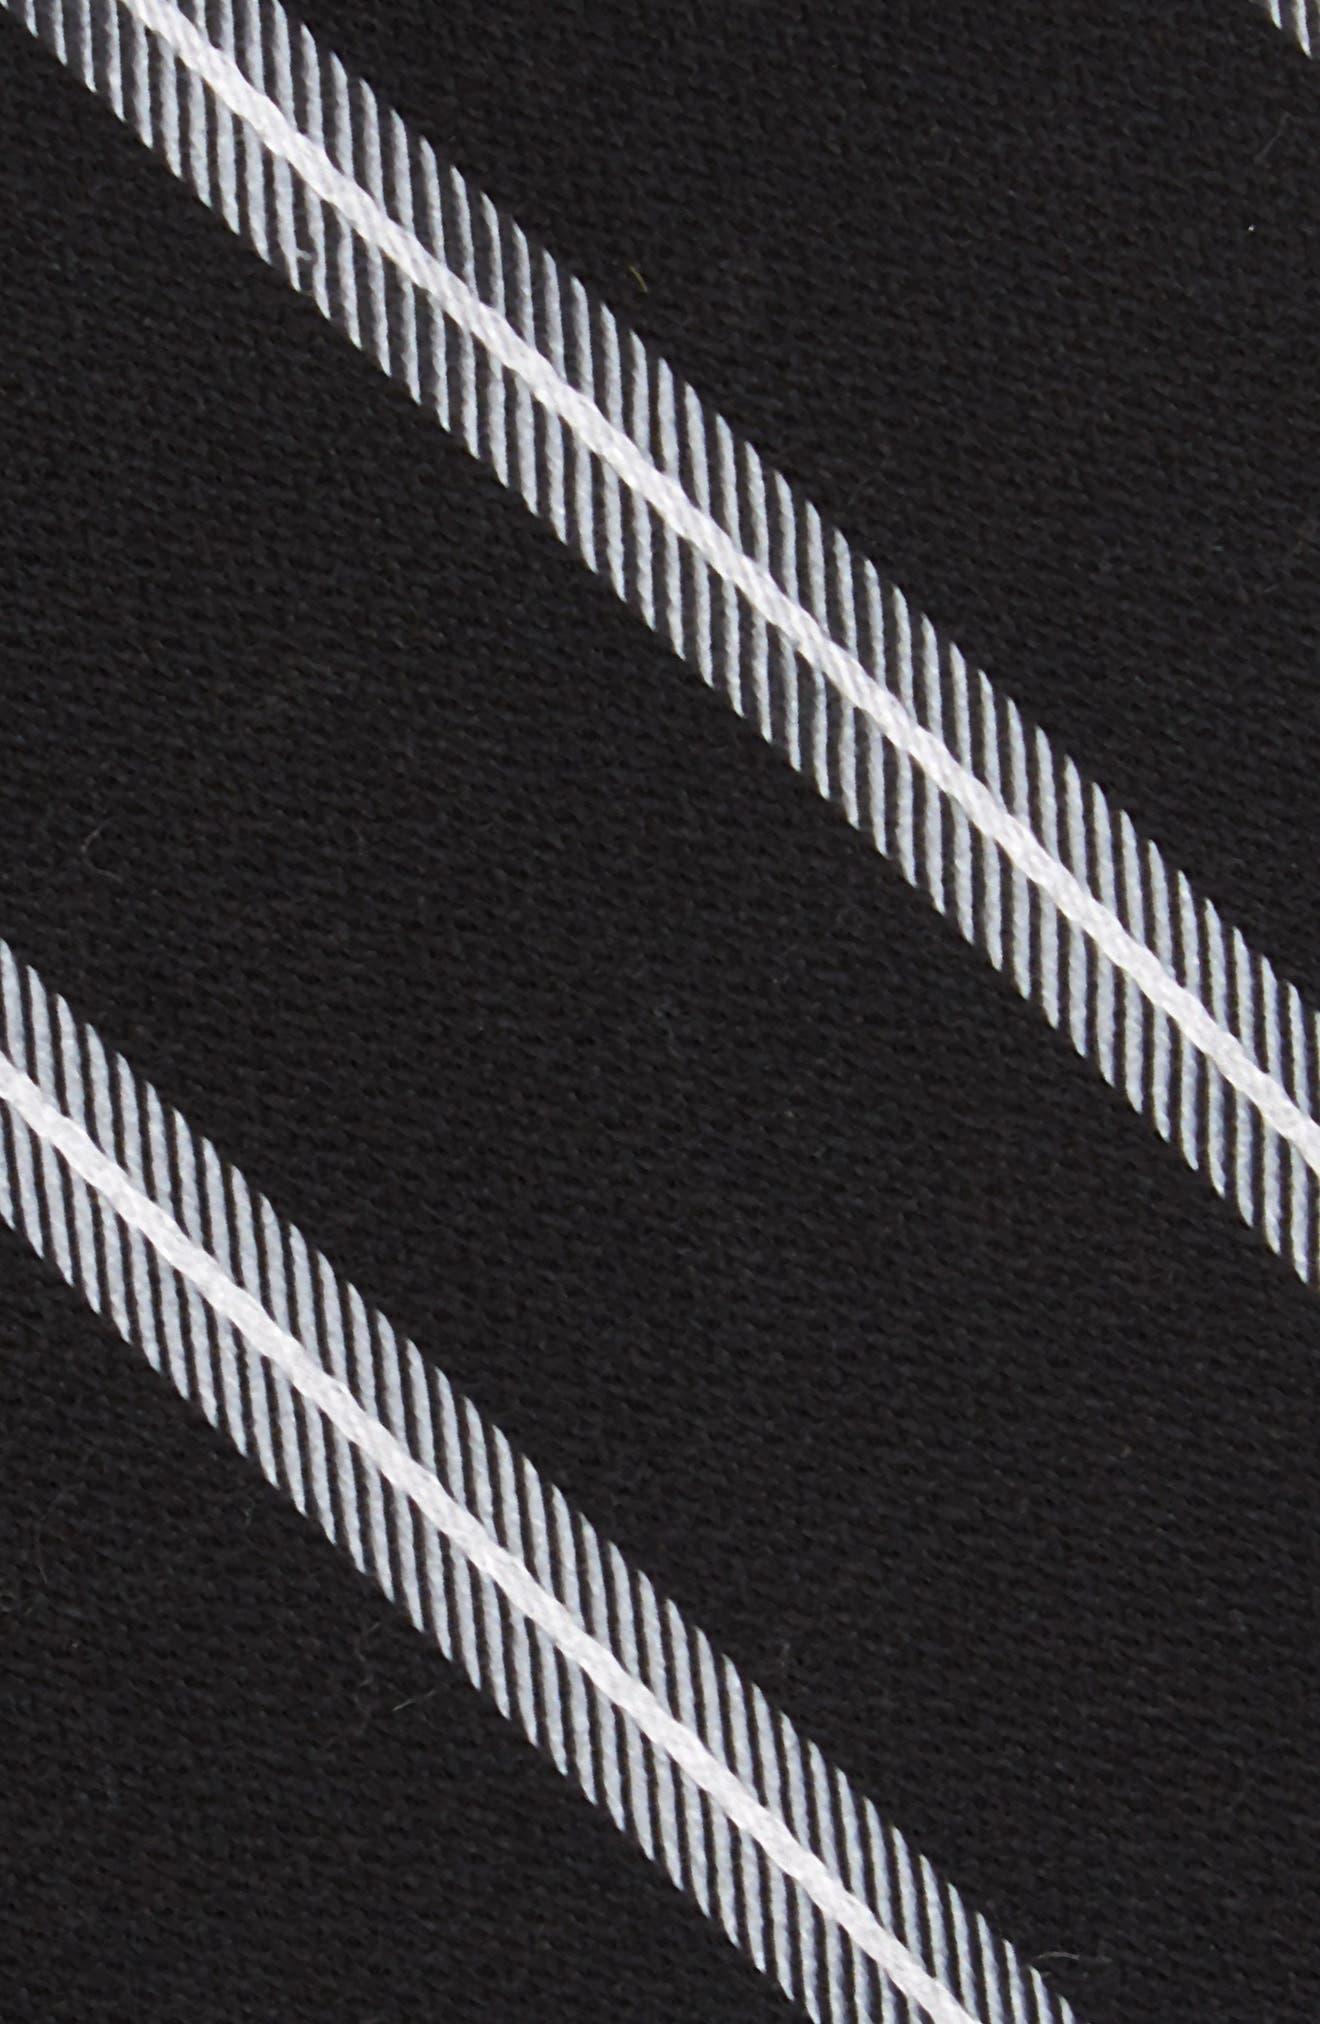 Edinger Stripe Silk & Cotton Tie,                             Alternate thumbnail 7, color,